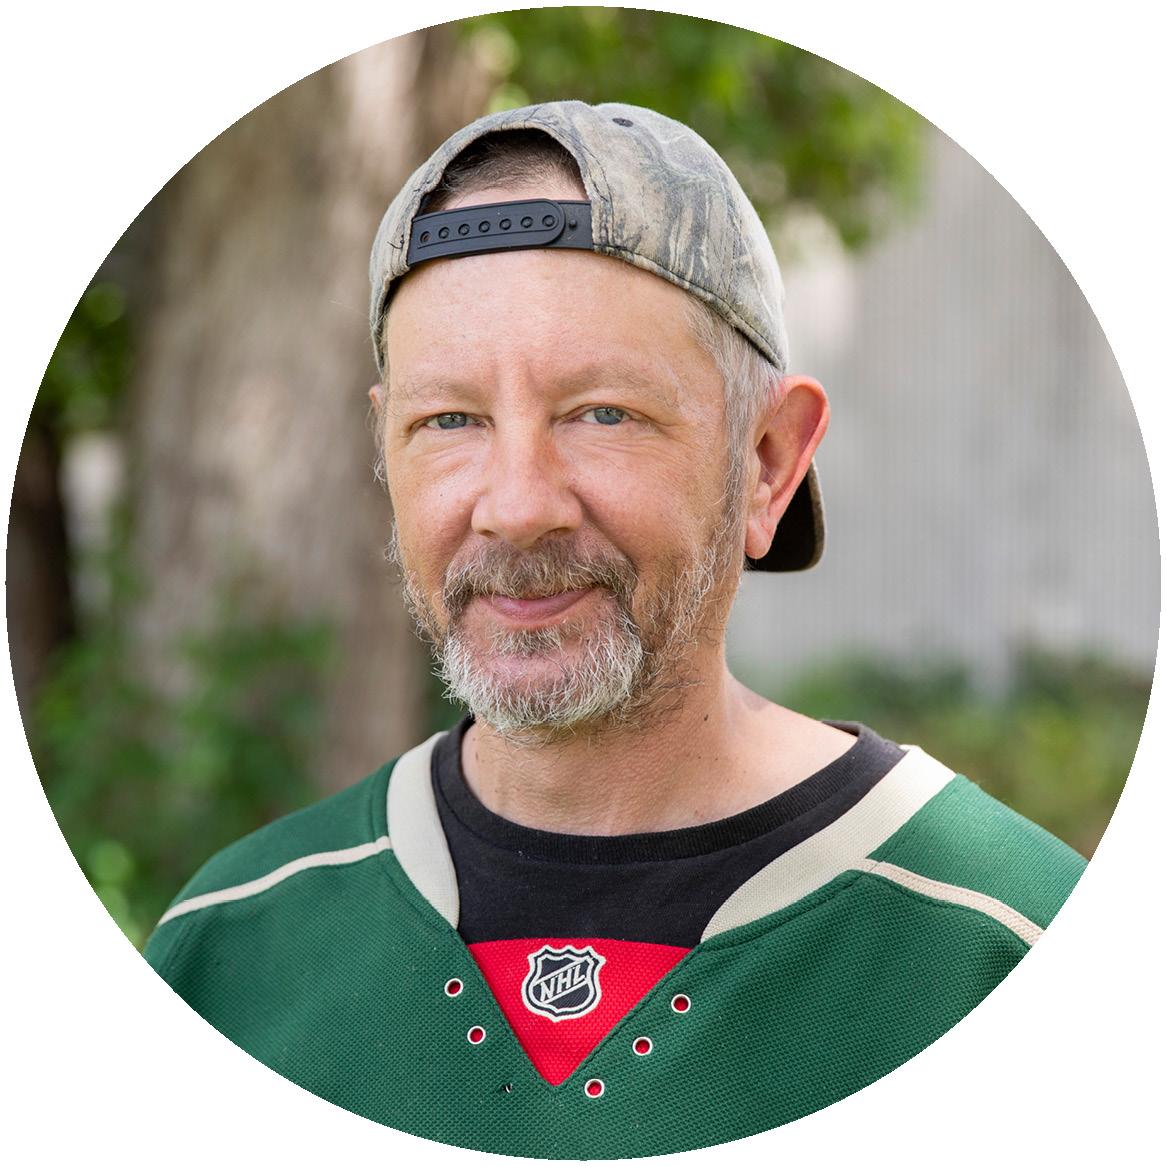 Mark Knutson